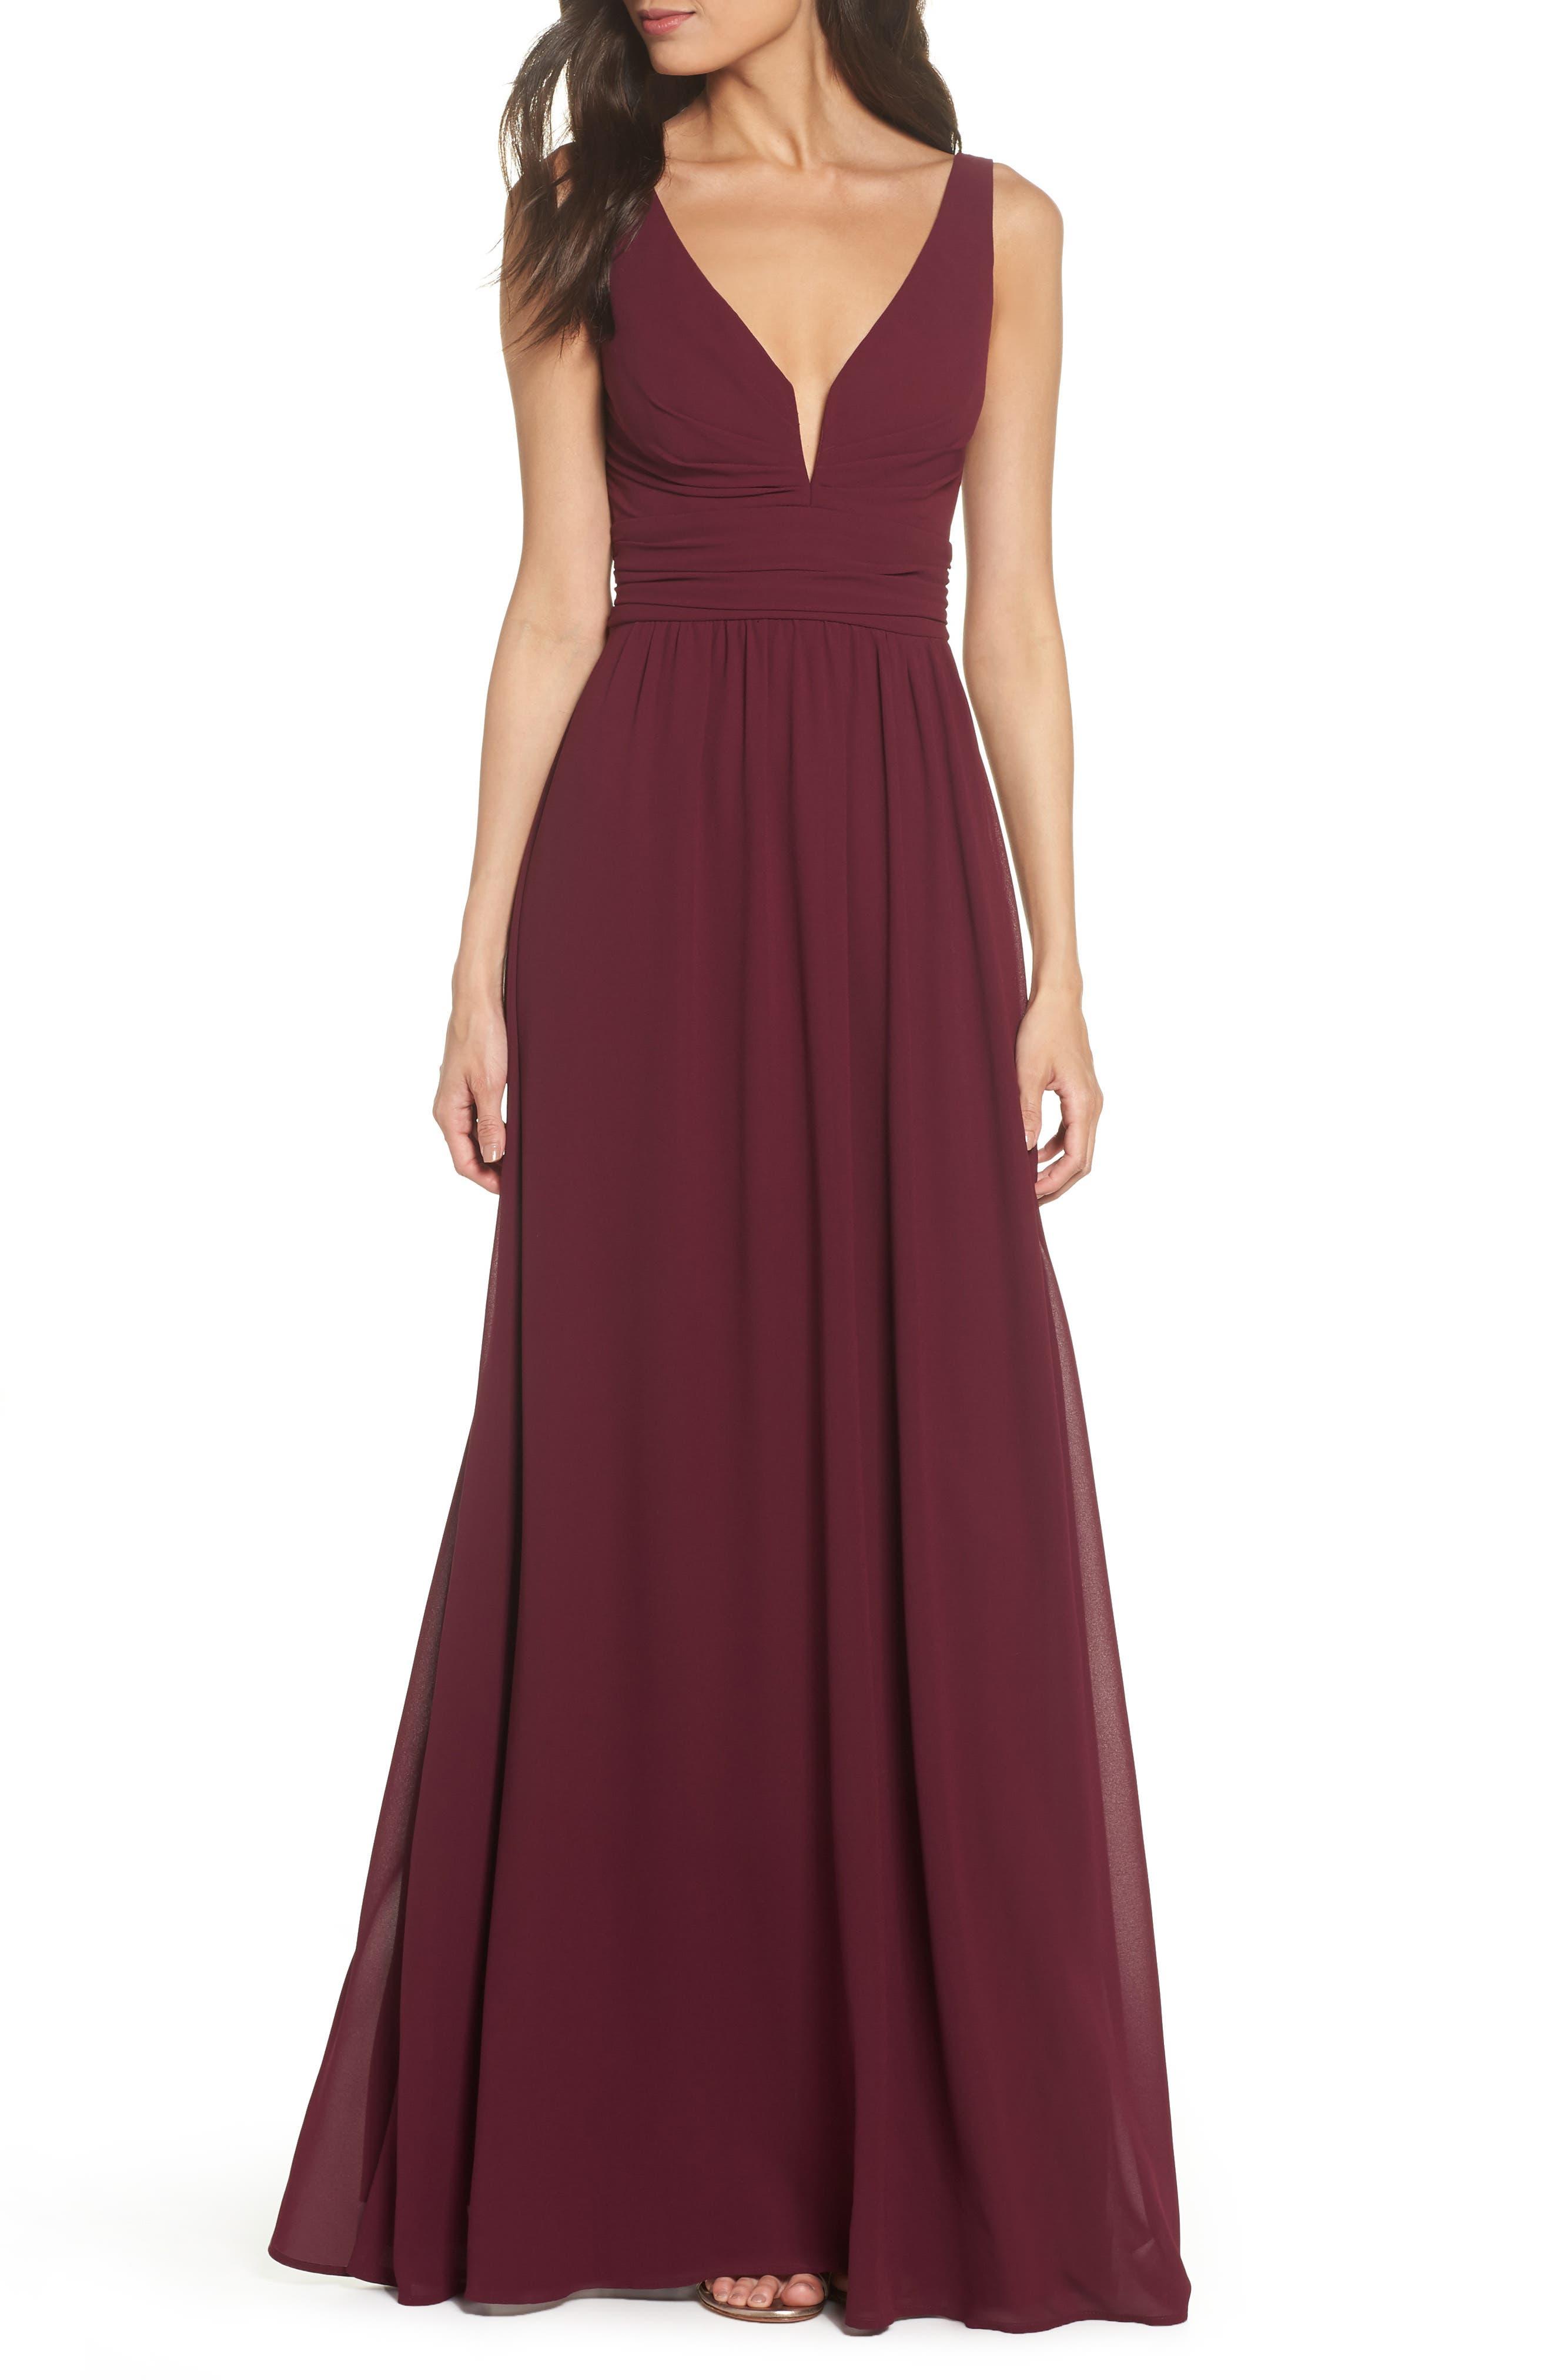 Lulus V-Neck Chiffon Gown, Burgundy